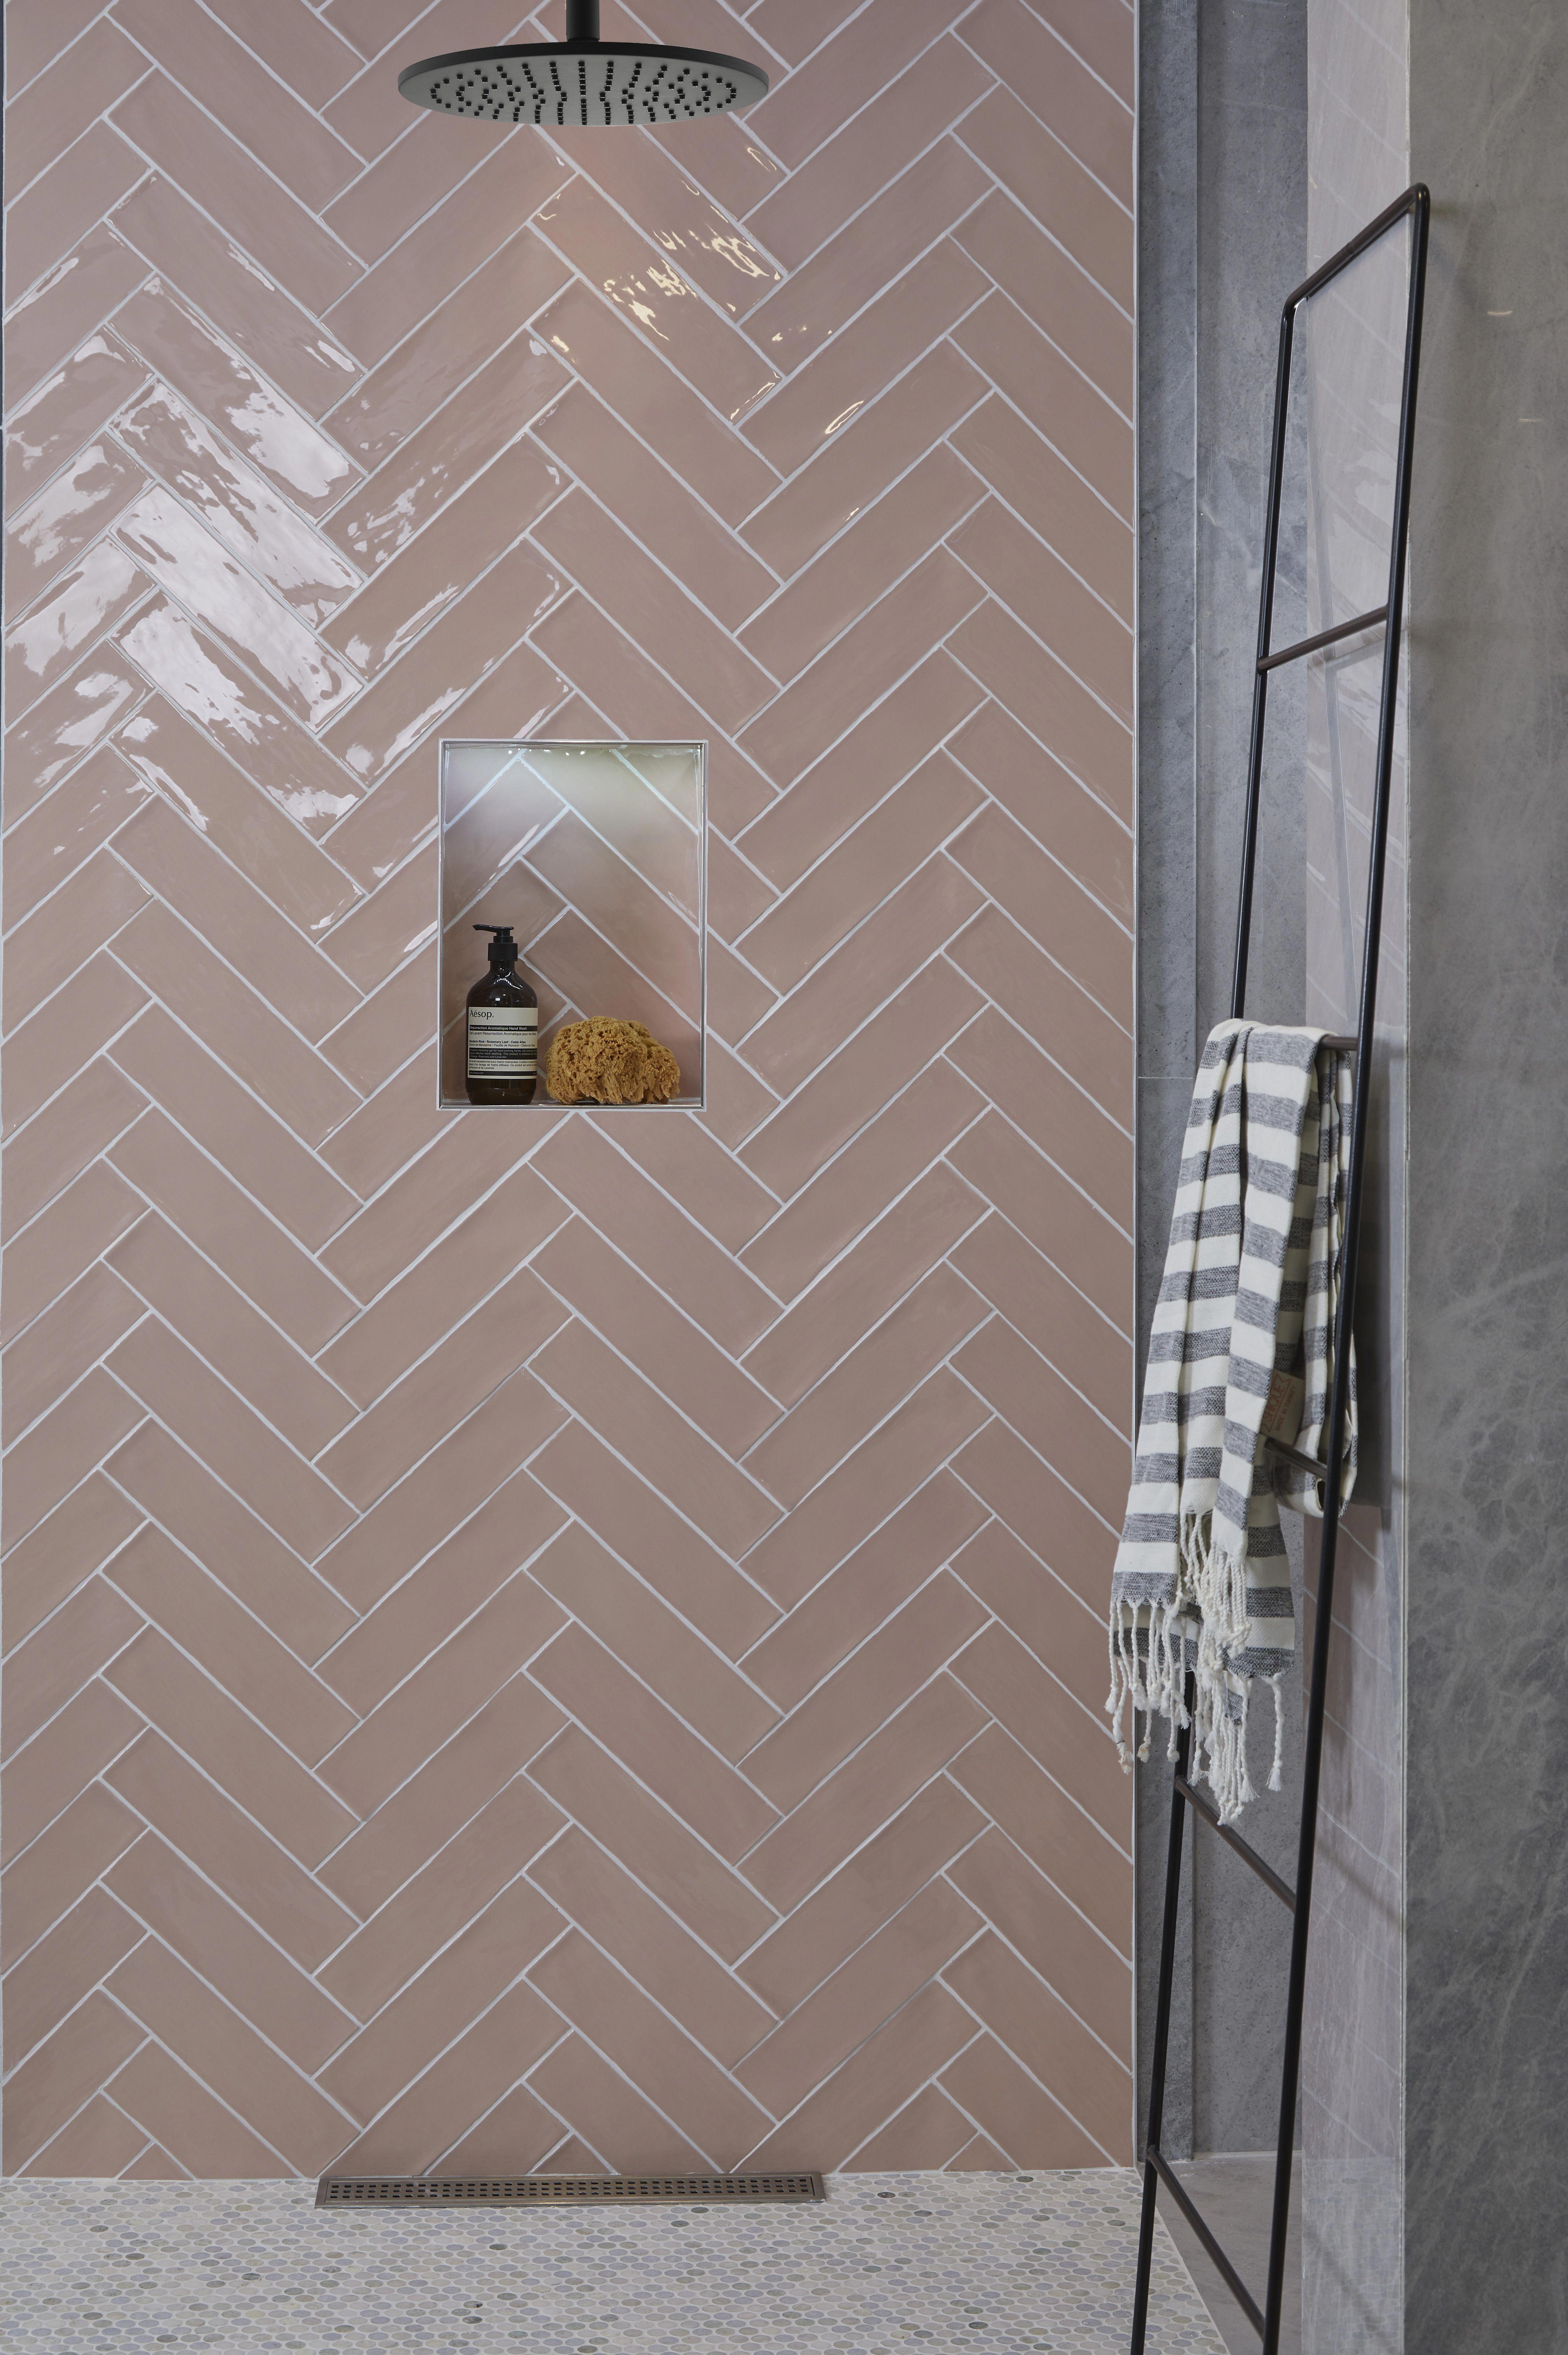 Carter Ceramic Azure Tiles Ca Pietra In 2020 Modern Master Bathroom Tile Bathroom Bathroom Interior Design